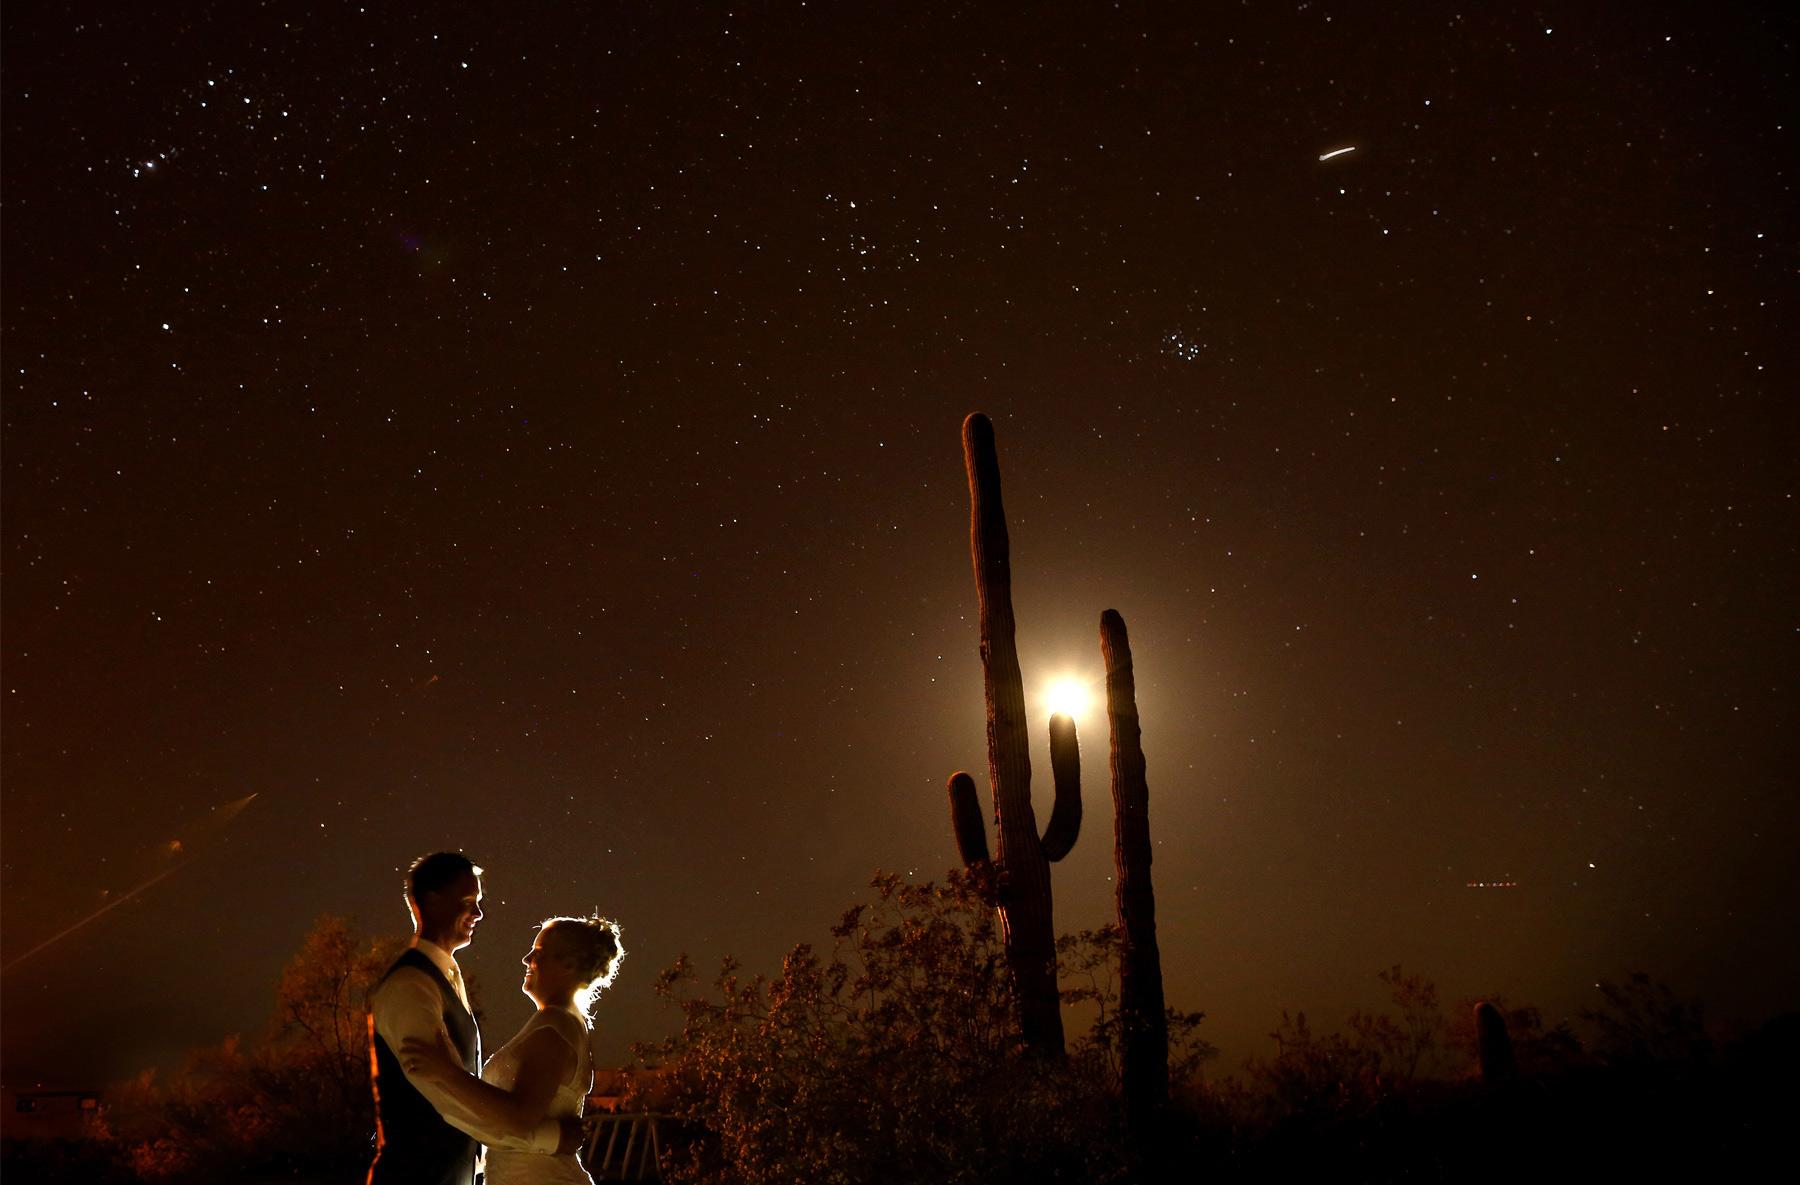 20-Tuscan-Arizona-Wedding-Photography-by-Vick-Photography-Destination-Wedding-Desert-Old-Tucson-Studios-Cactus-Sunset-Night-Photography-Elsa-and-Arthur.jpg